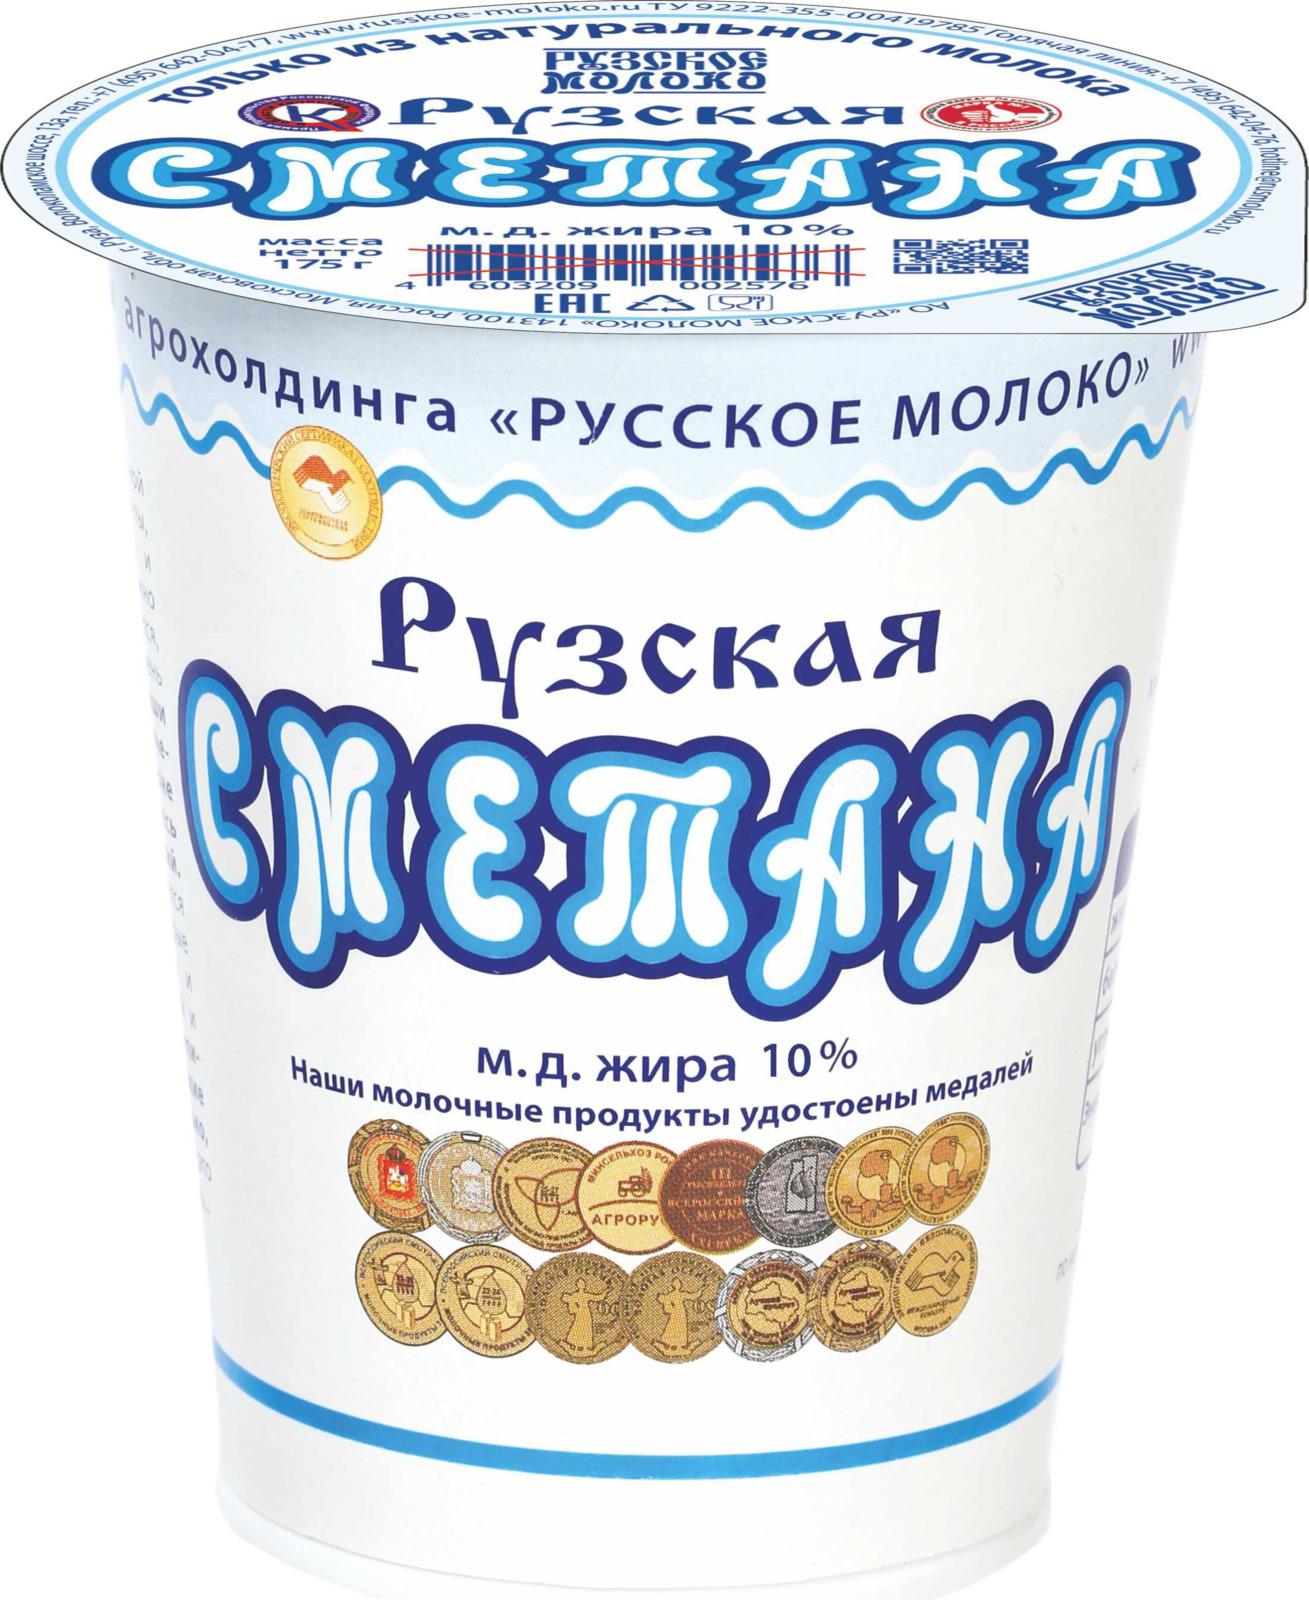 Сметана Рузское молоко, 10%, 175 г